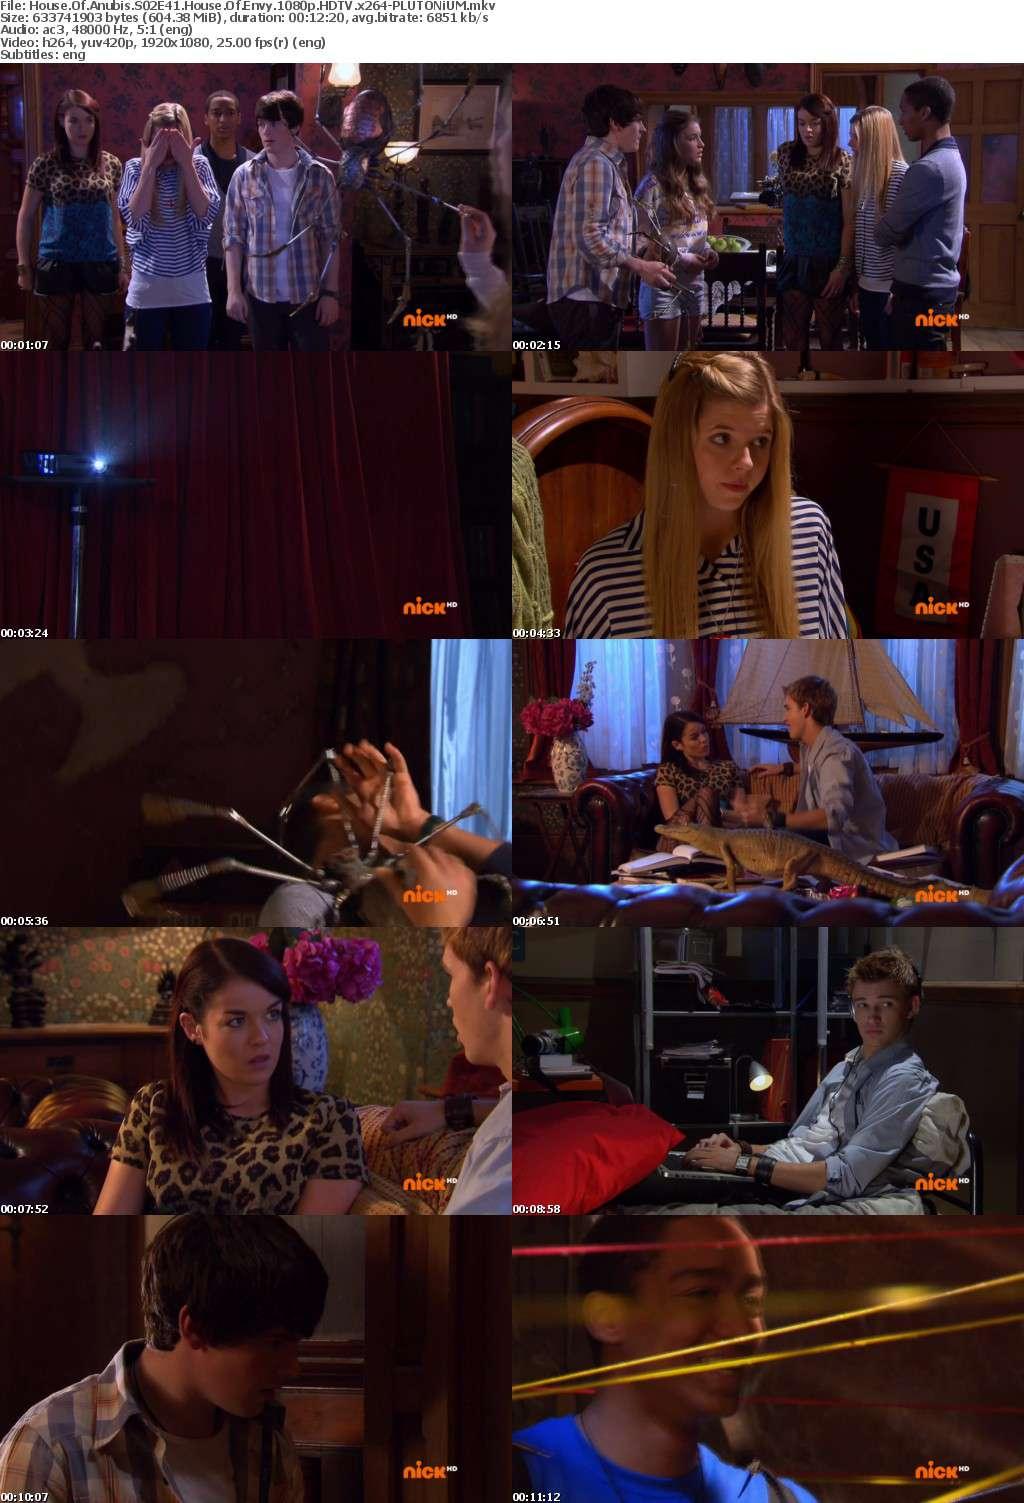 House Of Anubis S02E41 House Of Envy 1080p HDTV x264-PLUTONiUM